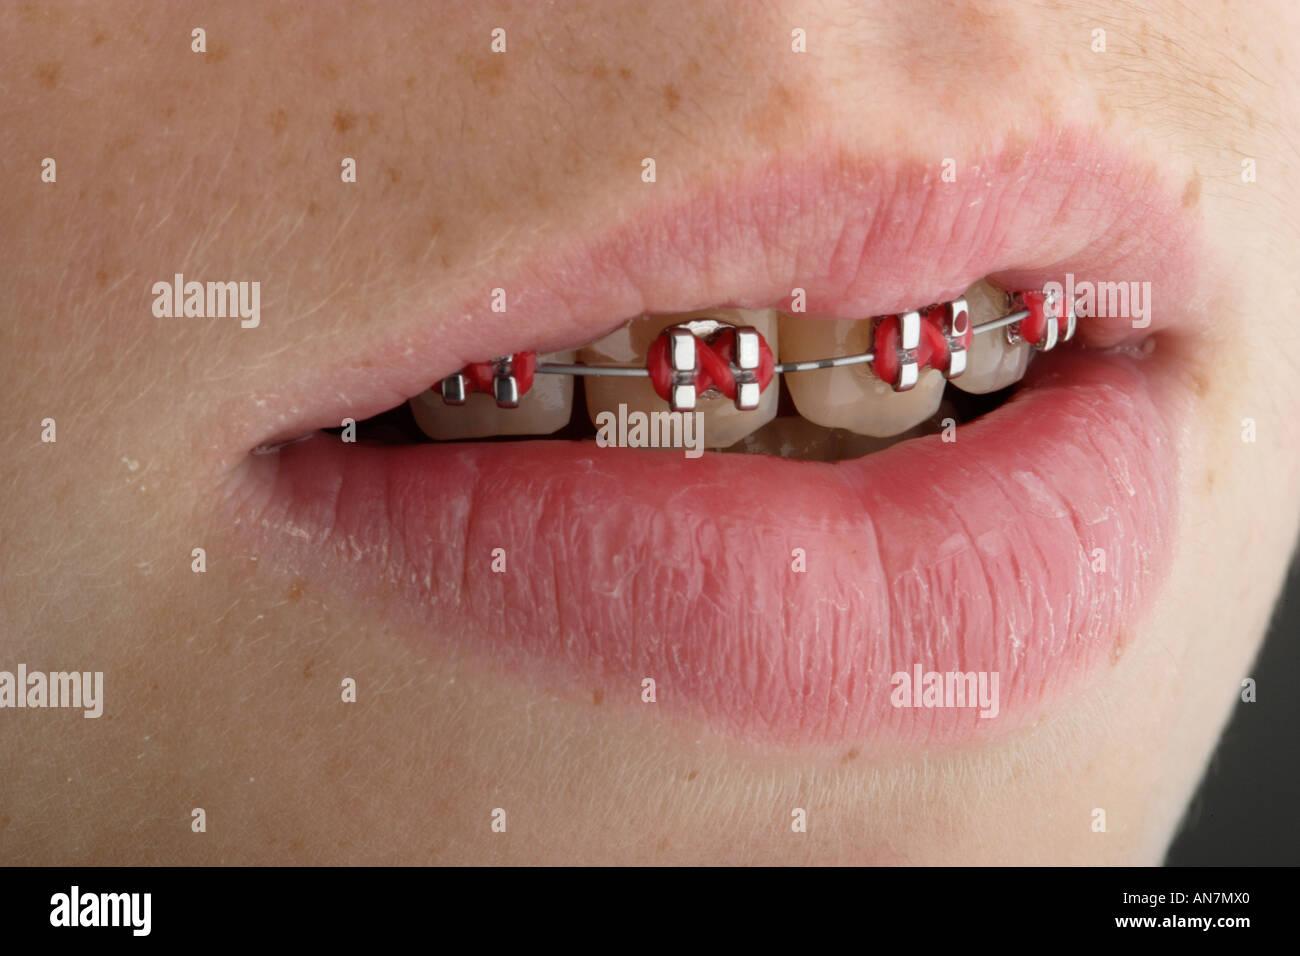 Othodontistry On Childs Teeth Brace Stock Photos & Othodontistry On ...